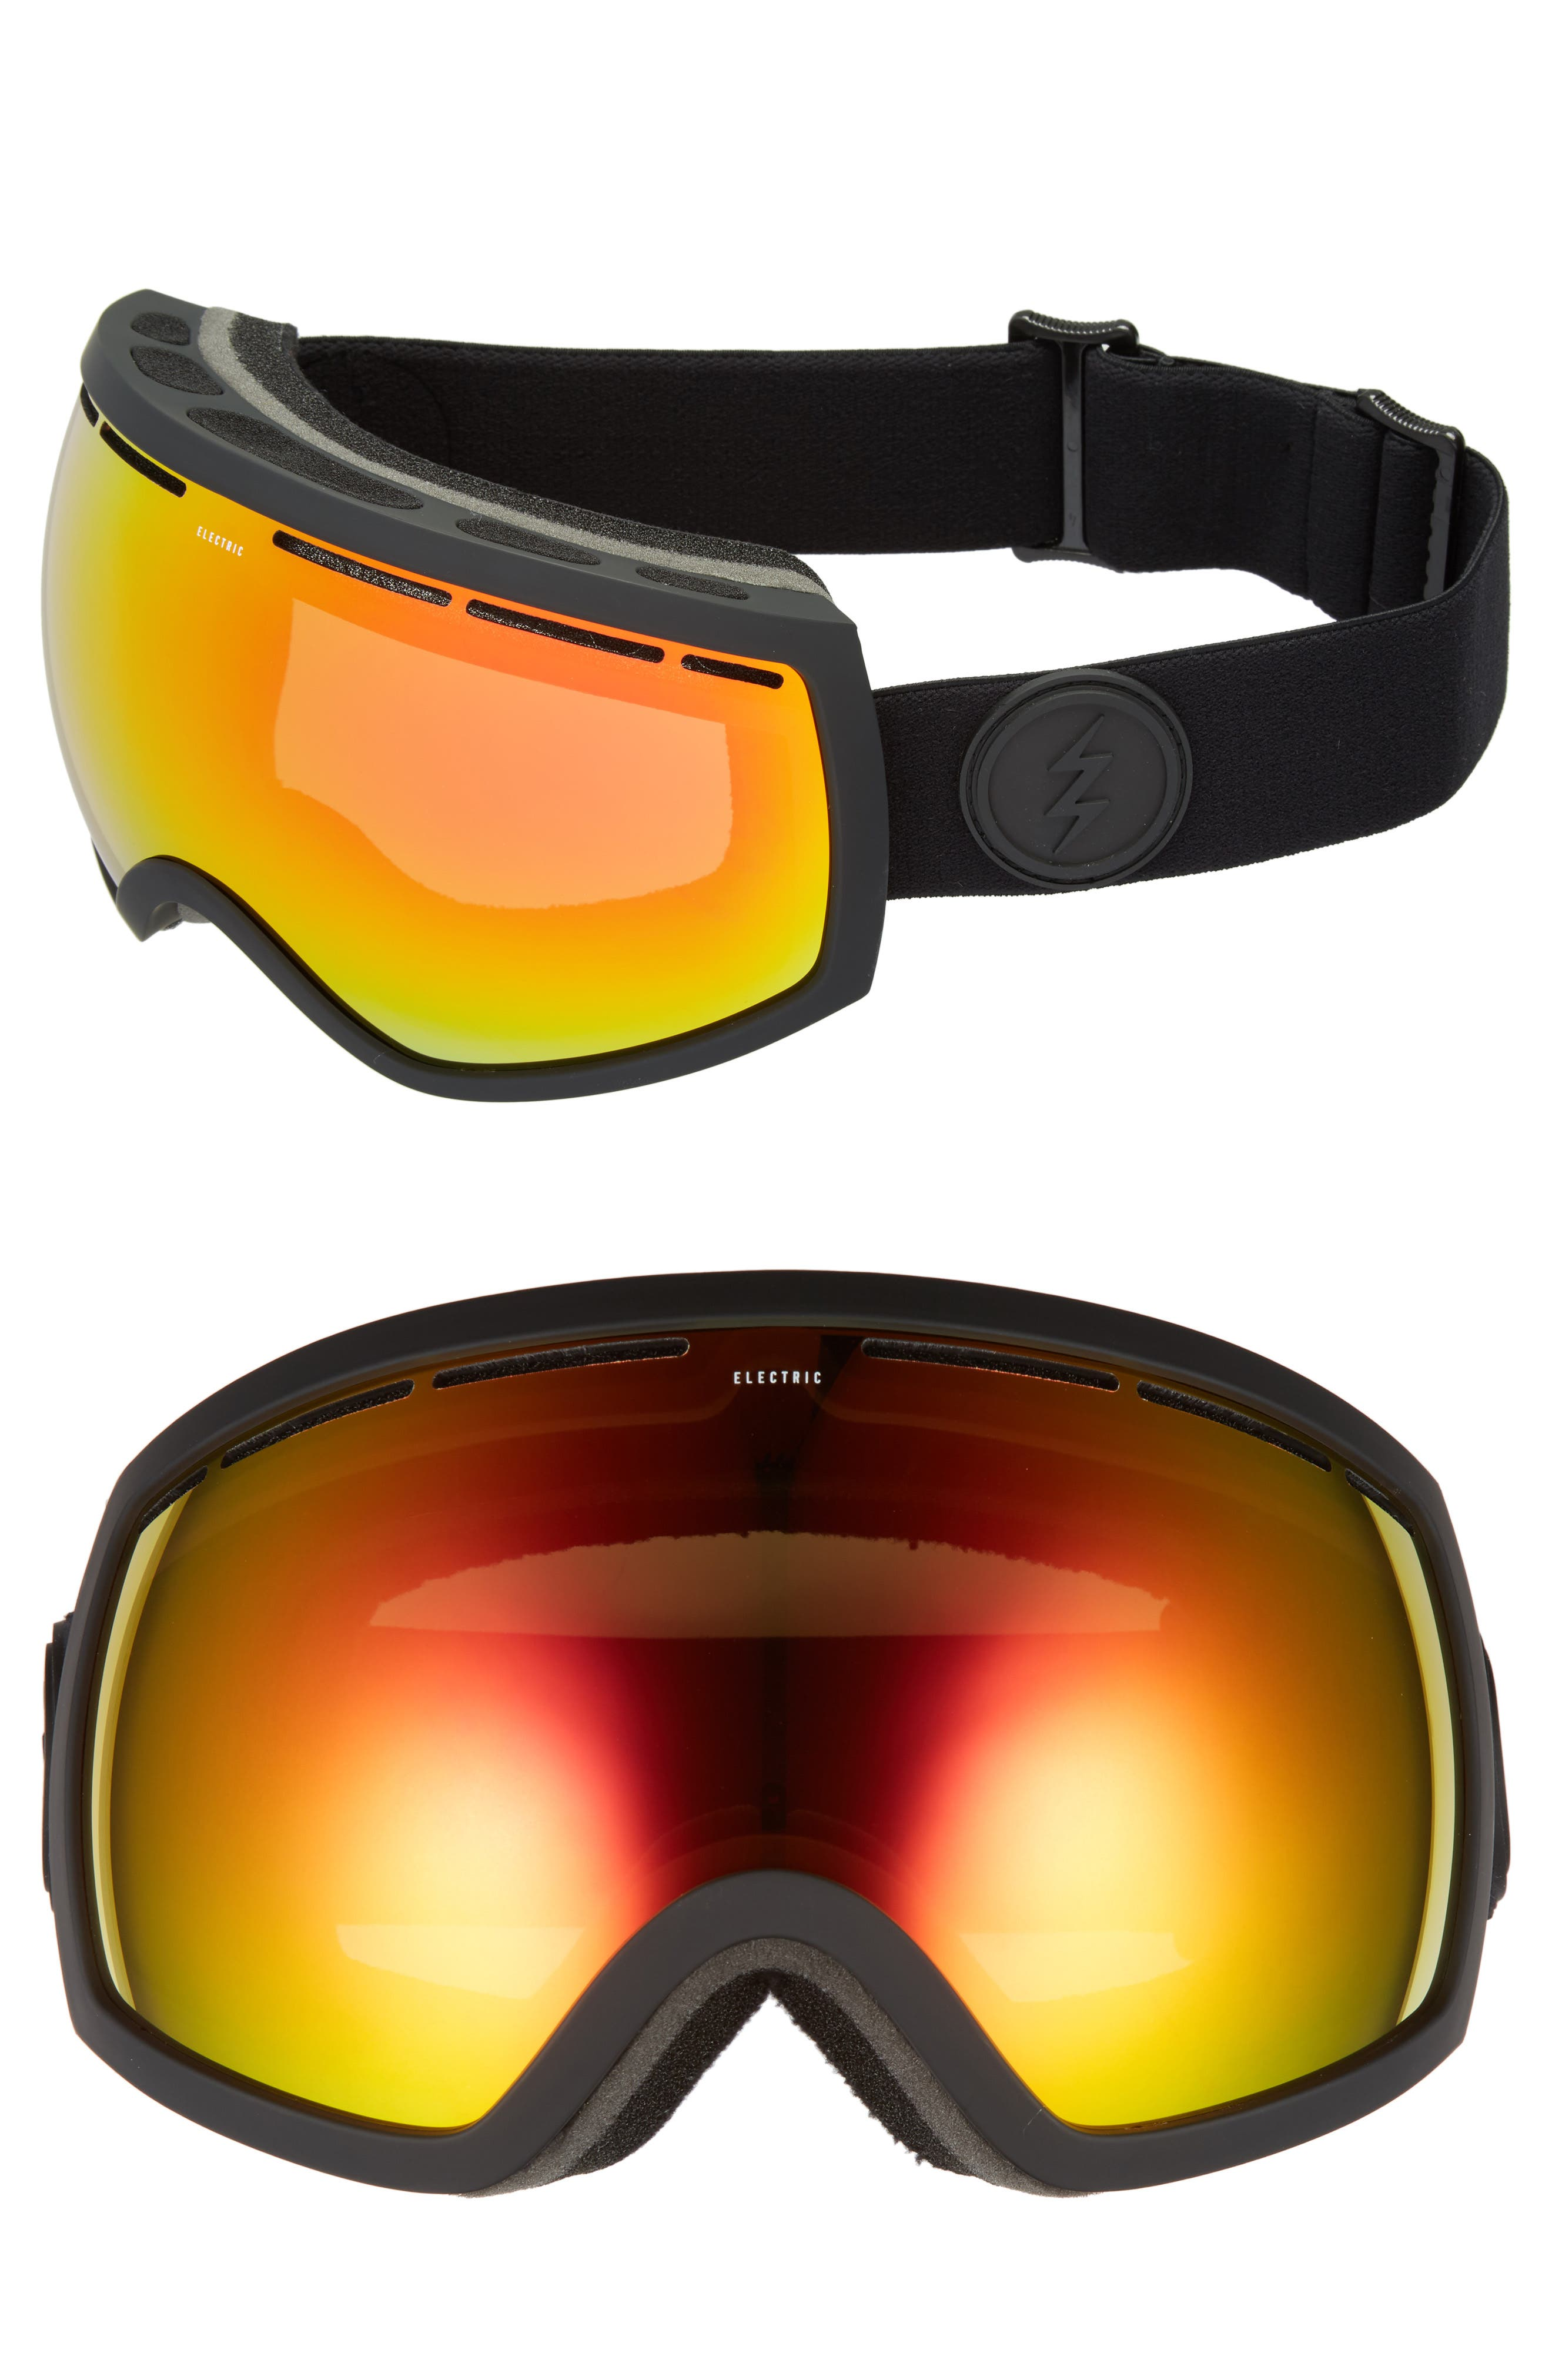 EG2 Snow Goggles,                             Main thumbnail 1, color,                             MATTE BLACK/ RED CHROME